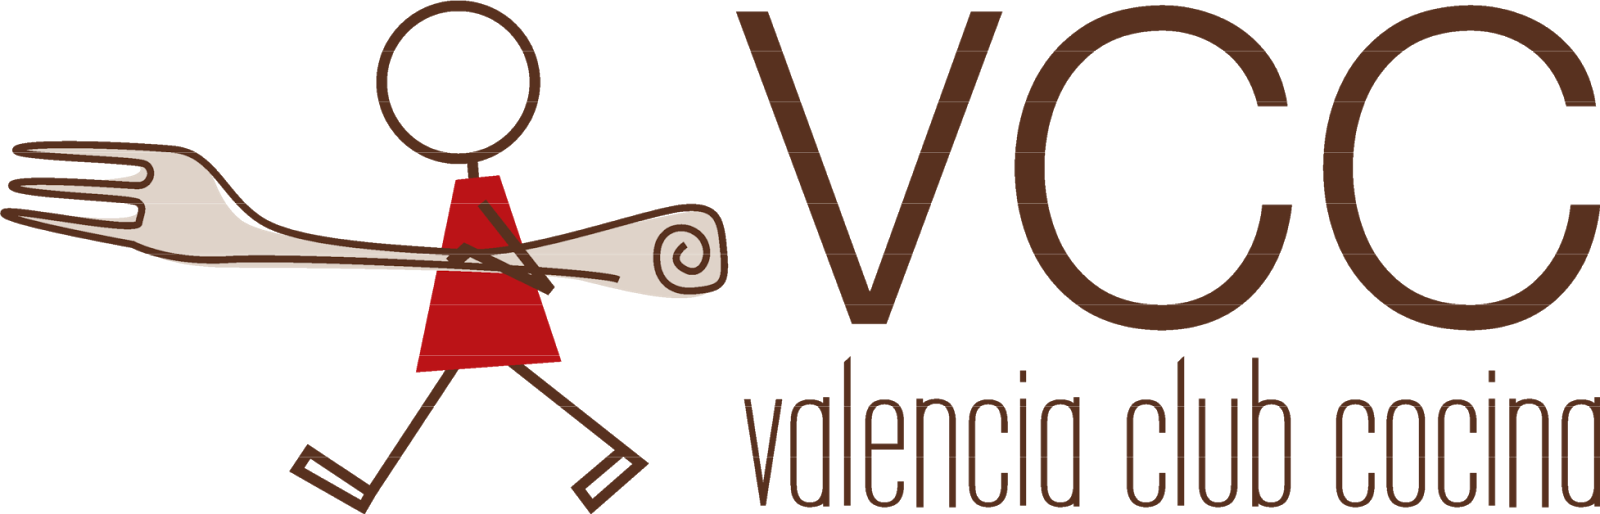 Cocina con angi i encuentro gastro blogger valencia - Valencia club cocina ...